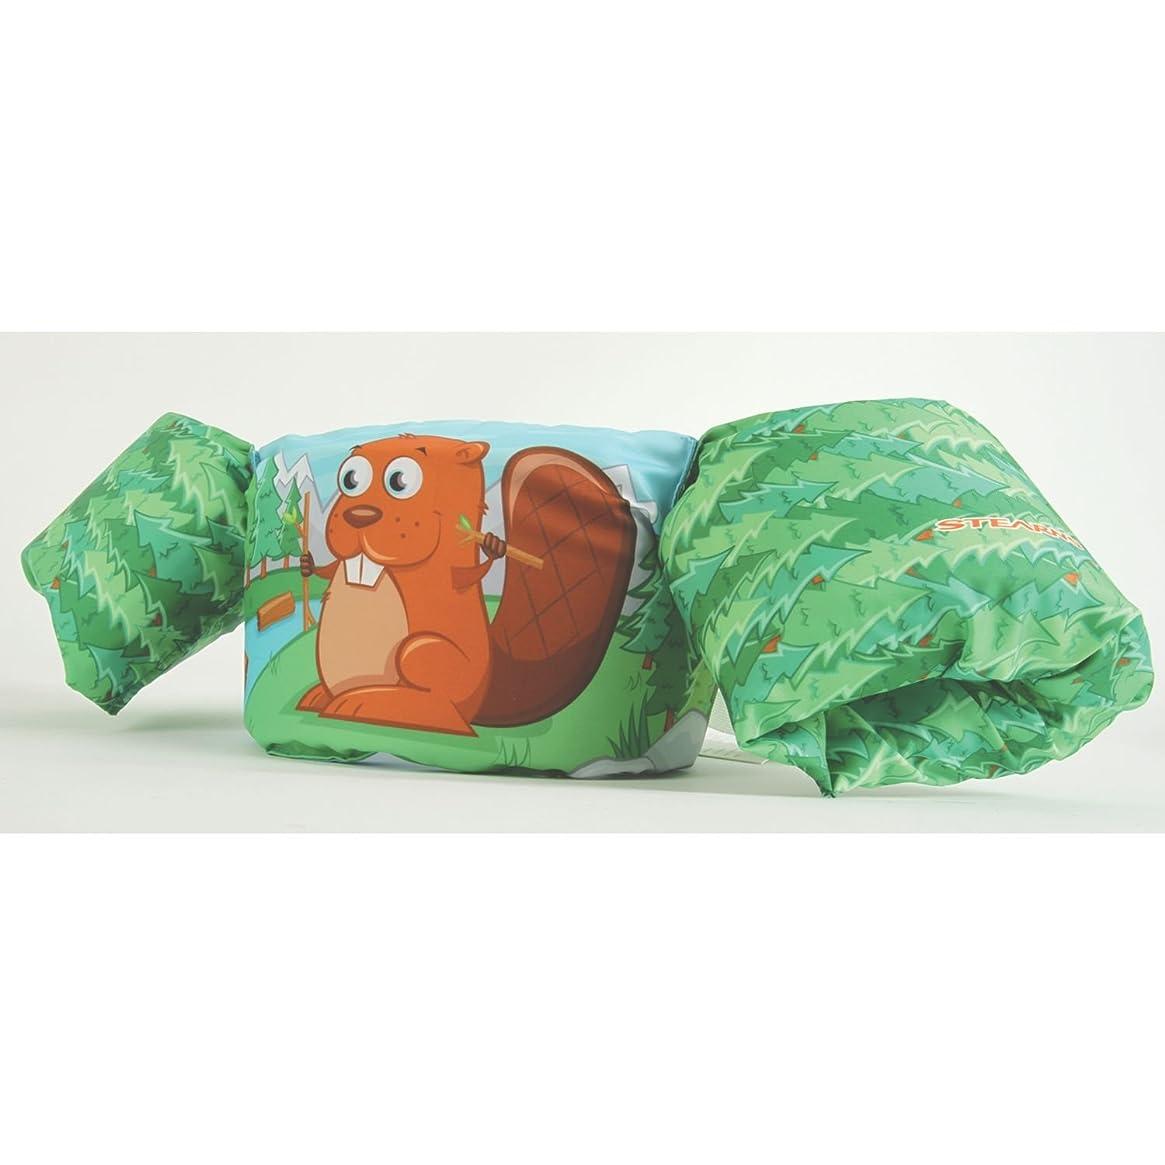 Stearns Kids Puddle Jumper Deluxe 3D Life Jacket, Beaver